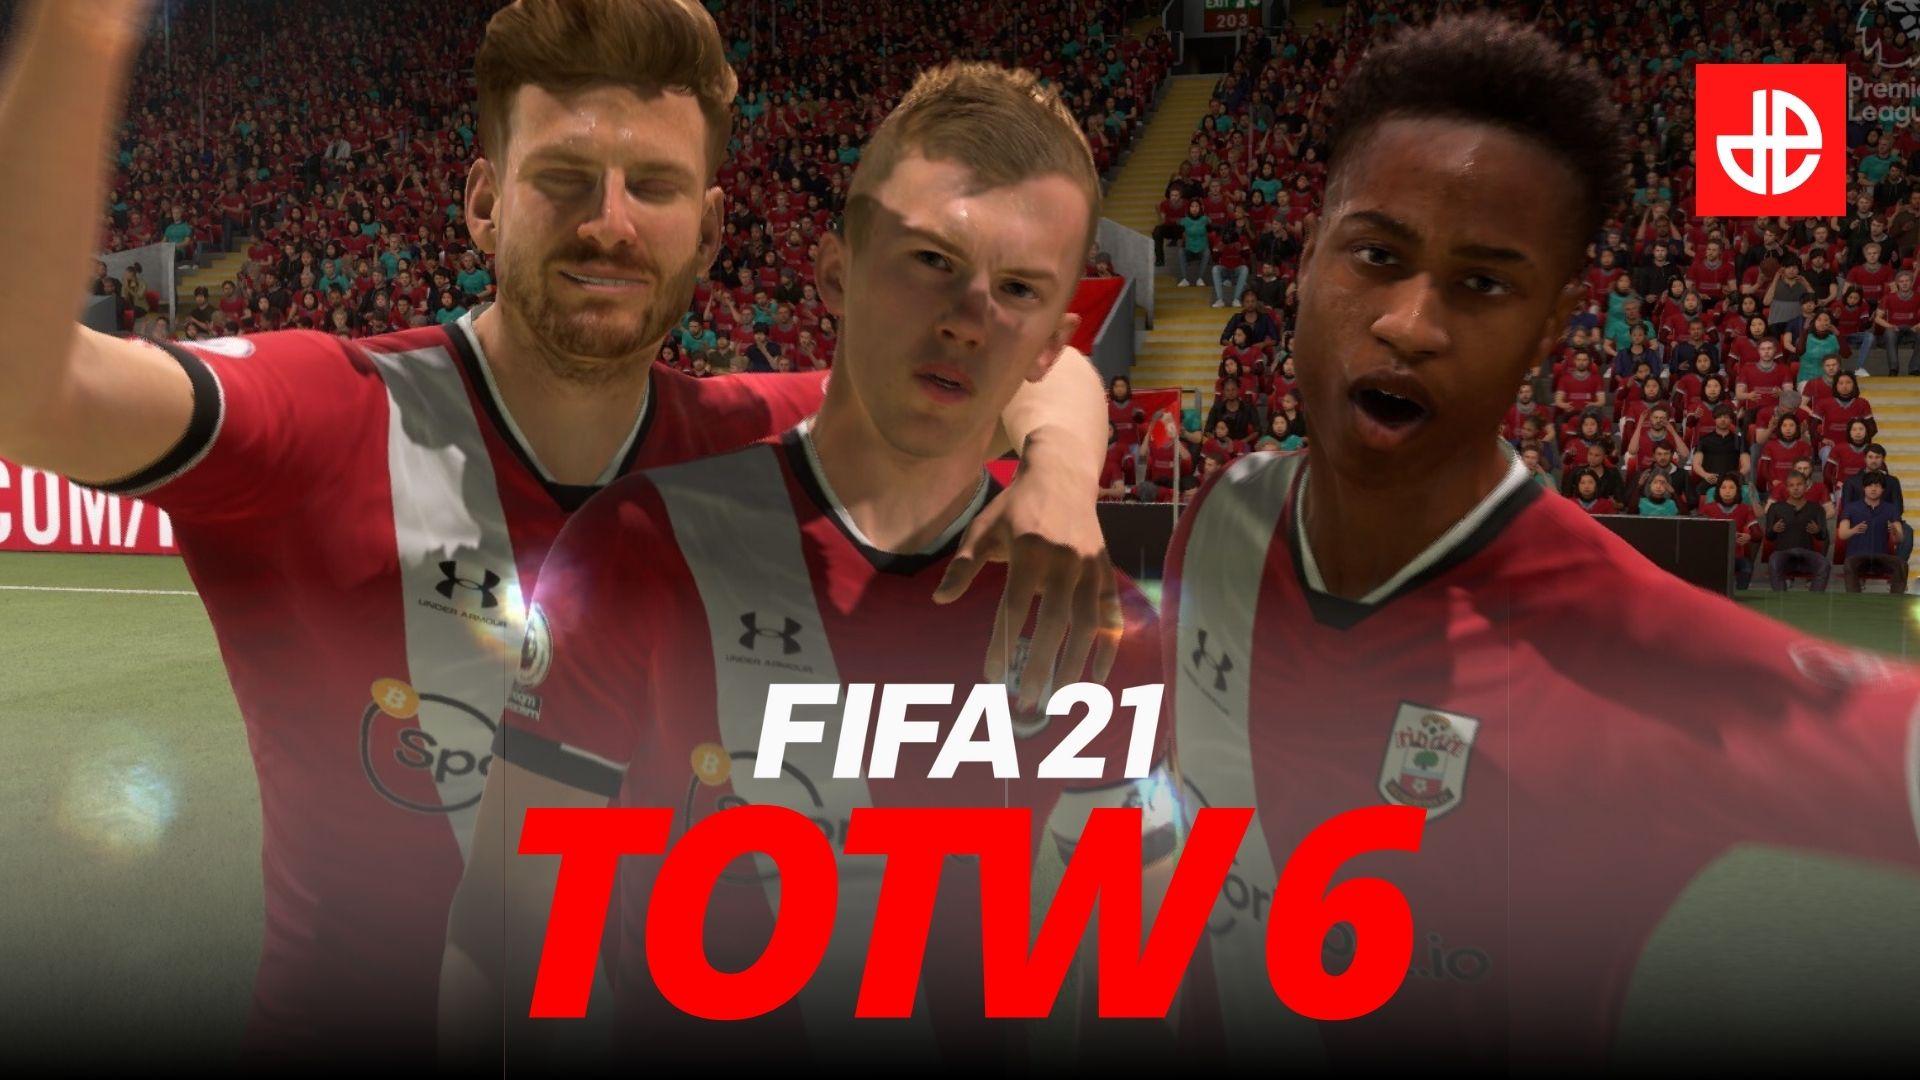 James Ward-Prowse celebrates Southampton goal in FIFA 21.